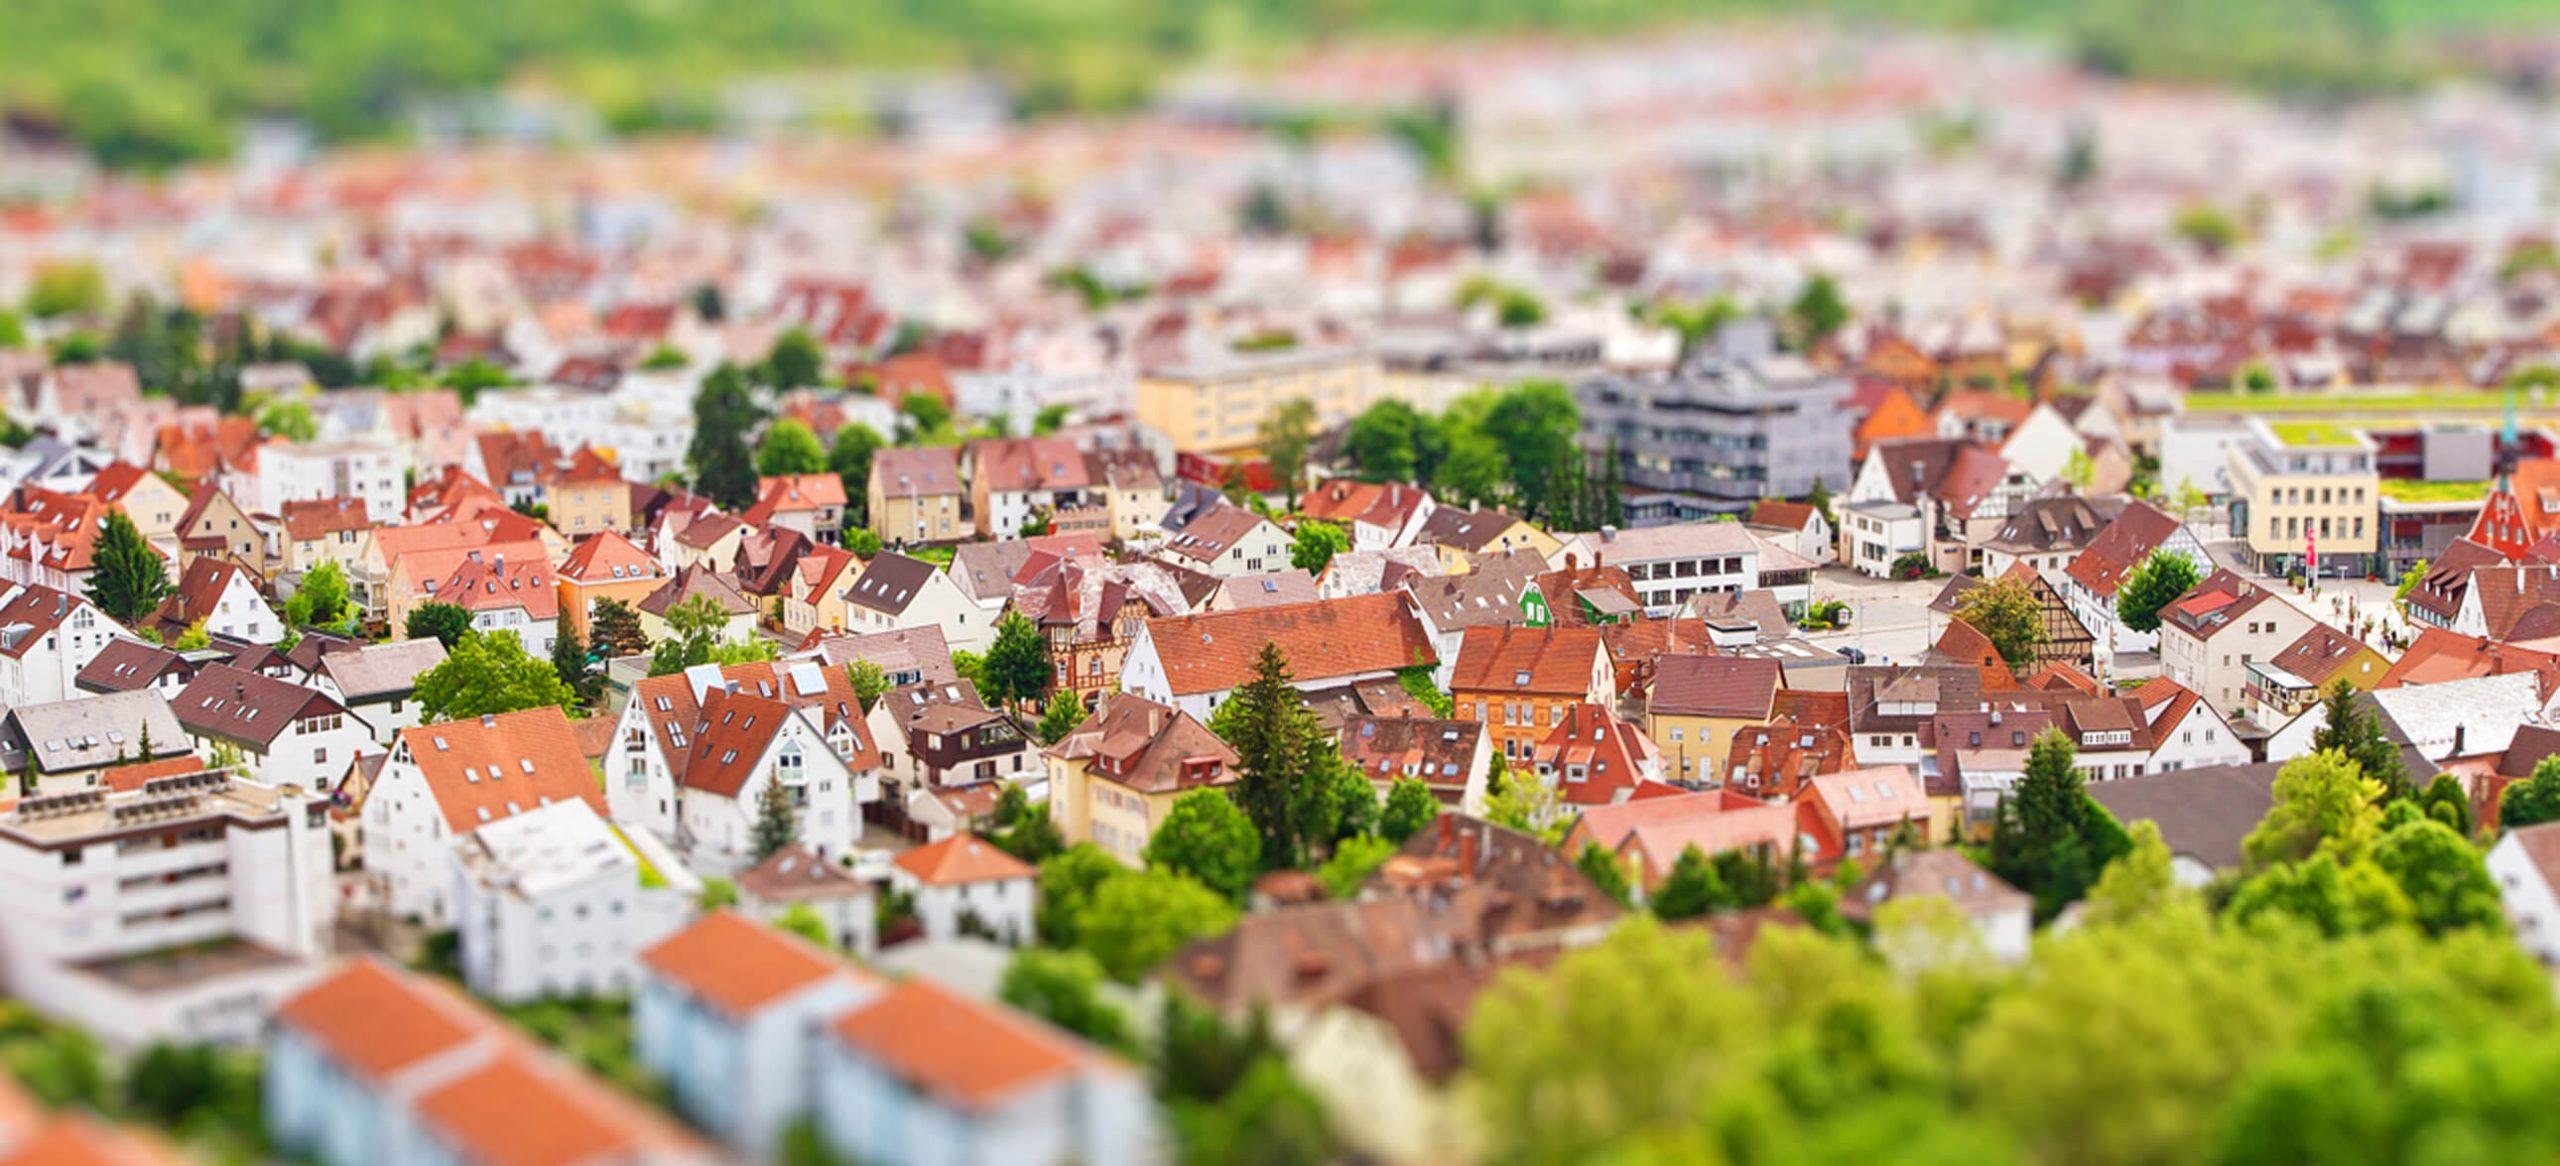 ImmoCenterKoeln - Immobilien Köln Düsseldorf Bonn